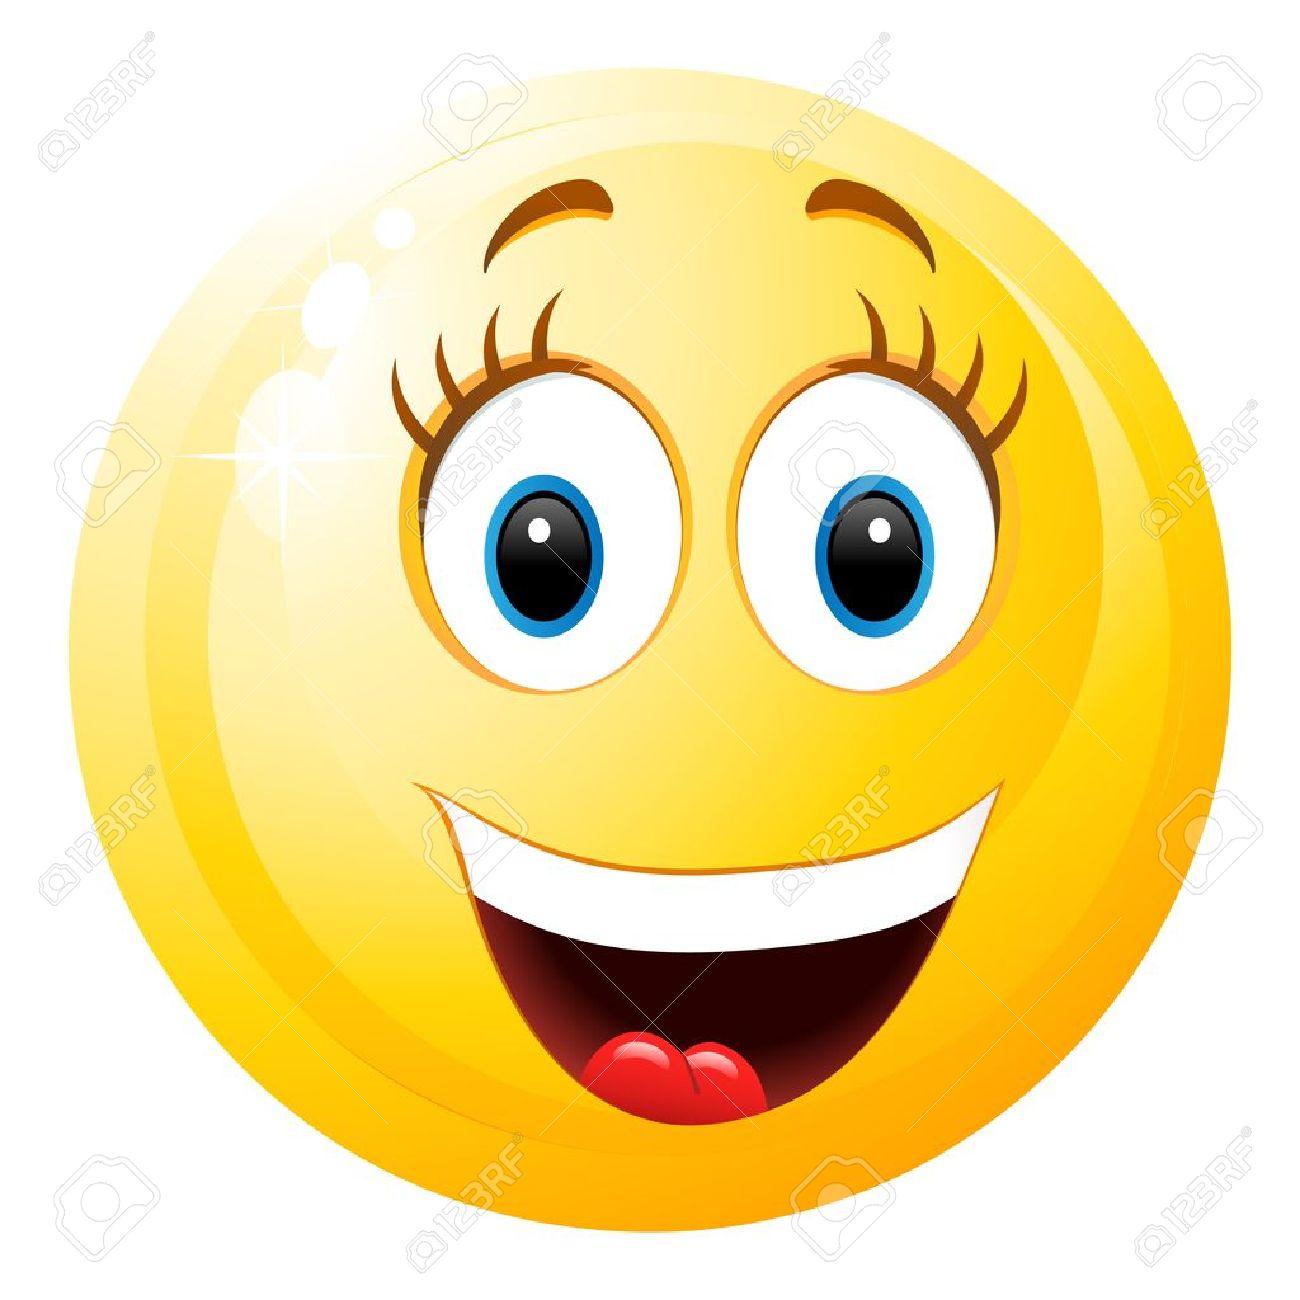 laughing smiley girl - 21950615